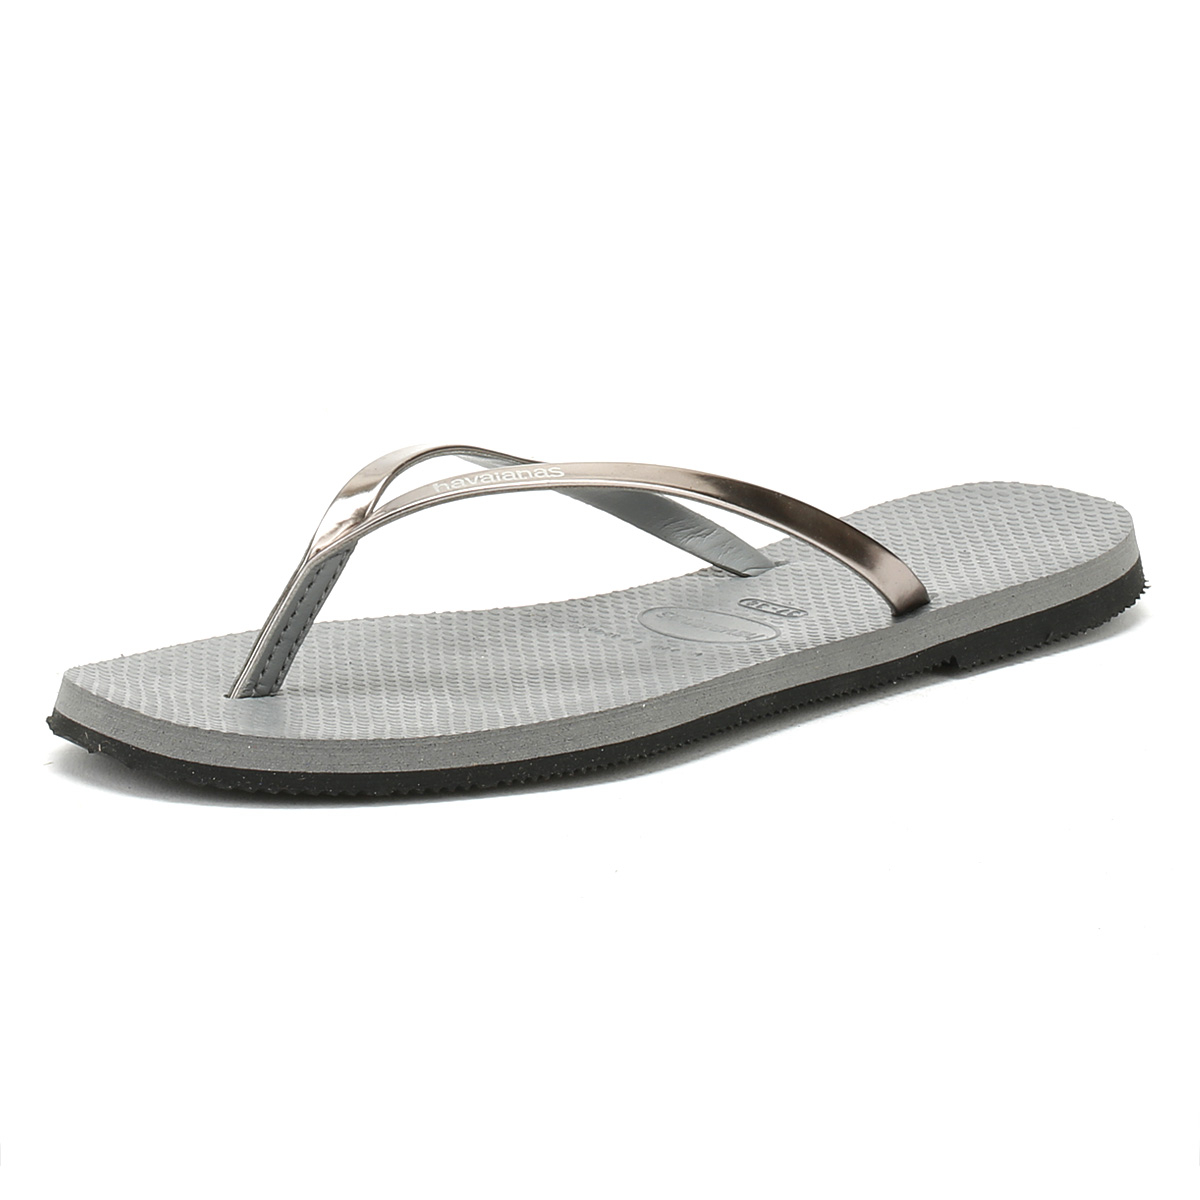 46f39147e Details about Havaianas Womens Sandals Grey You Metallic Flip Flops Summer  Beach Ladies Shoes